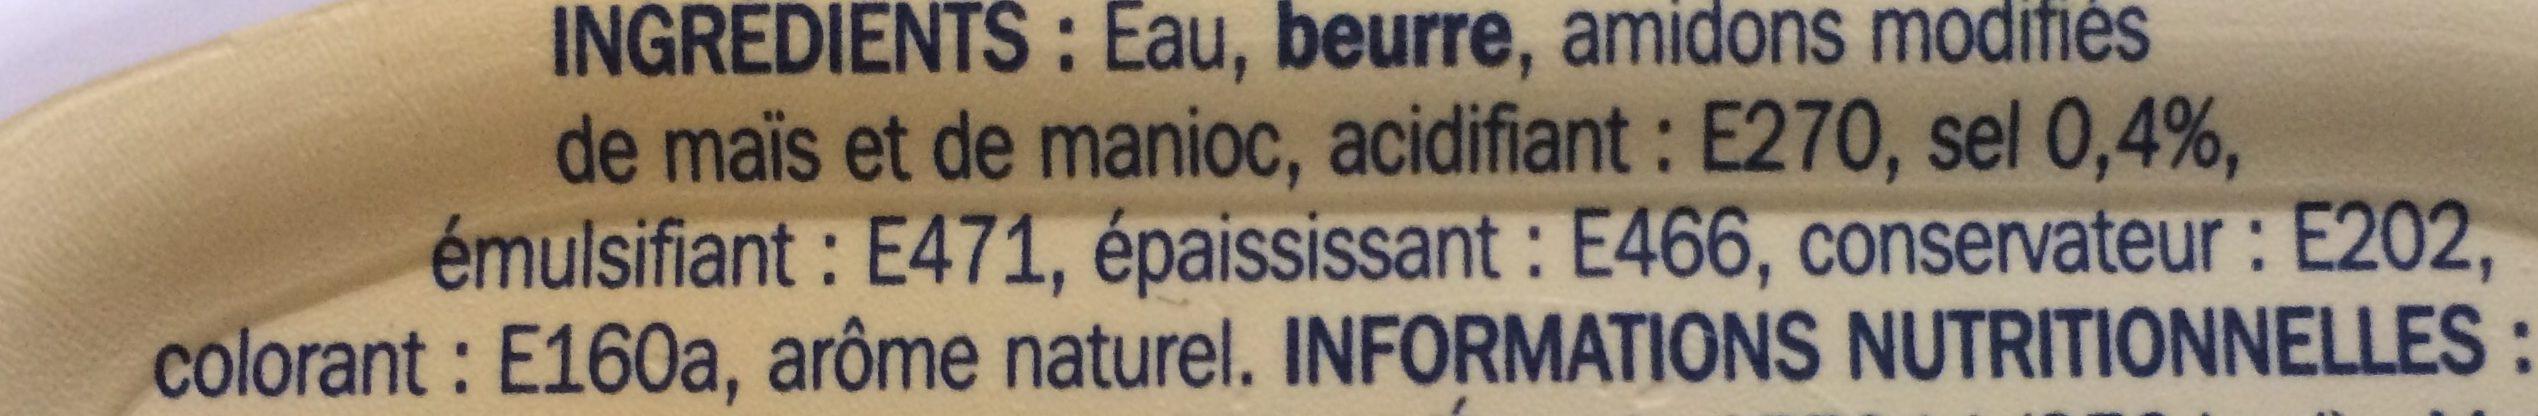 Beurrier tendre et léger doux 40 % Mat. Gr. - Ingredients - fr